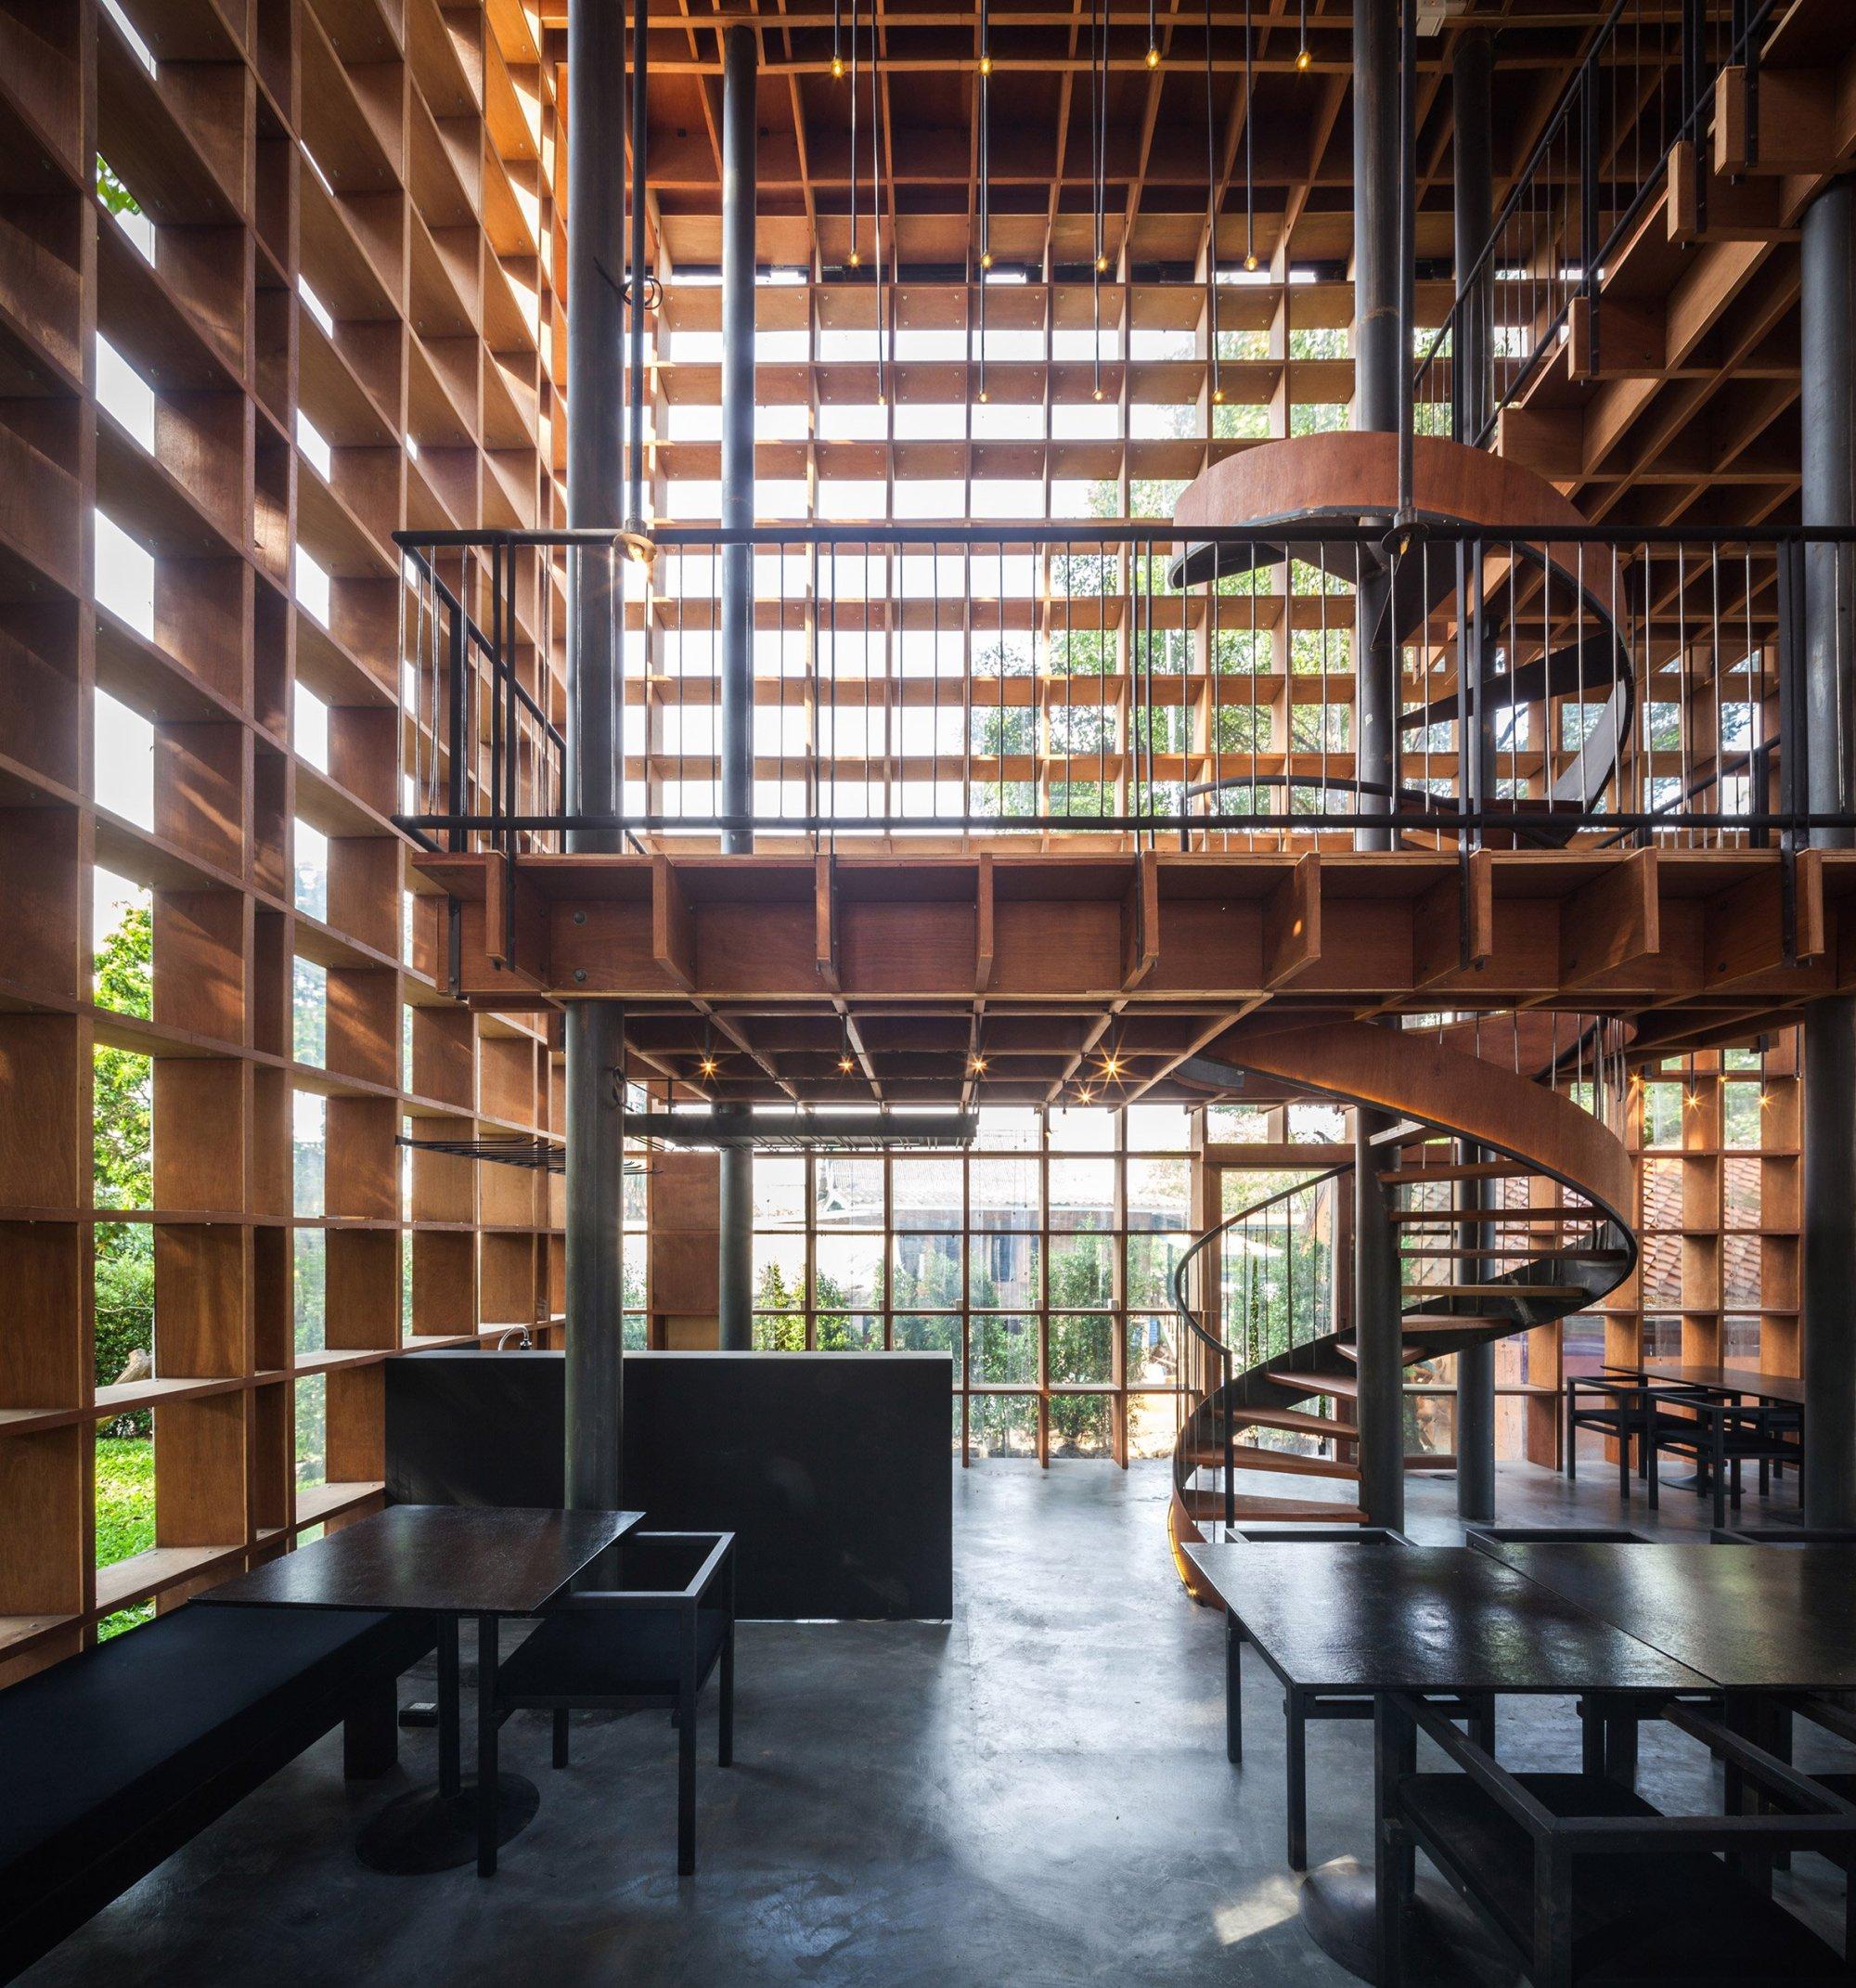 wine-bangkok-project-studio-architecture-public-leisure-thailand-_dezeen_2364_col_11 (1)